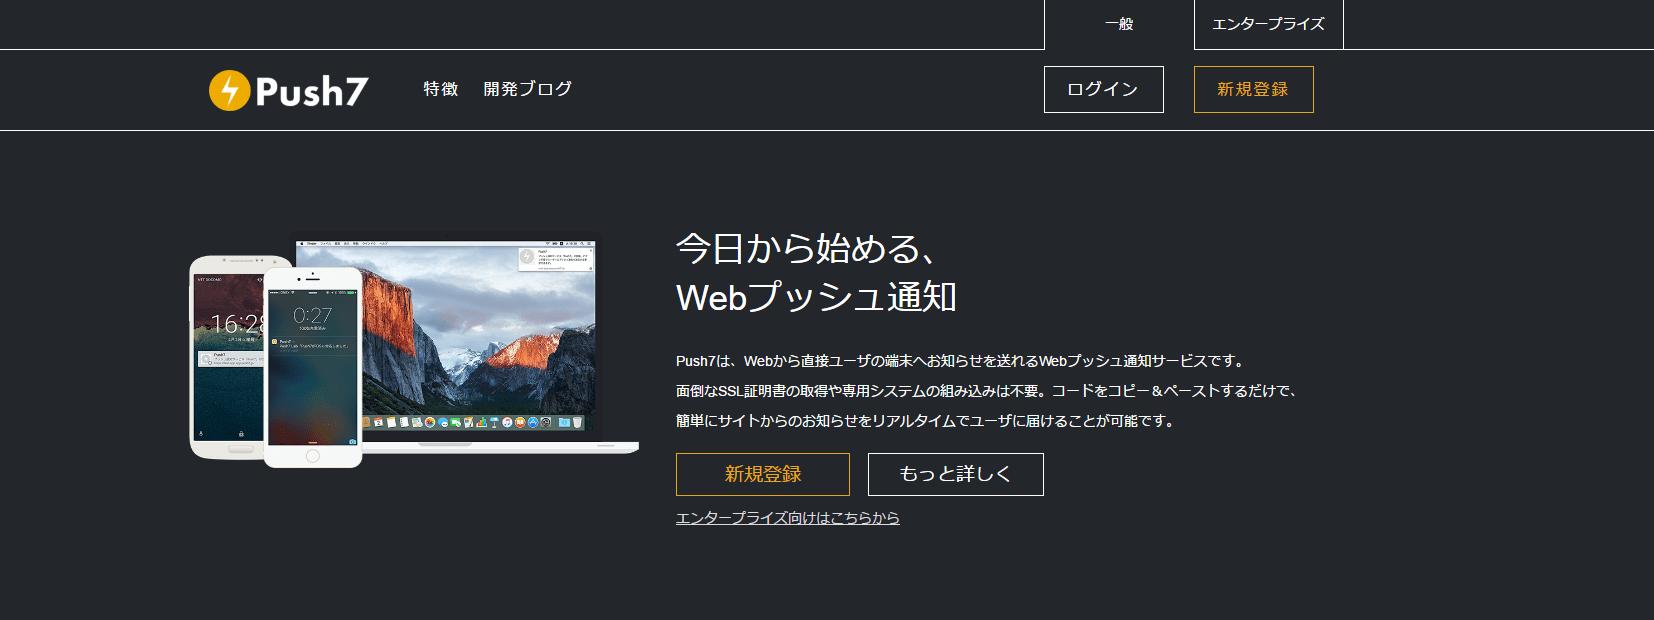 push7_login